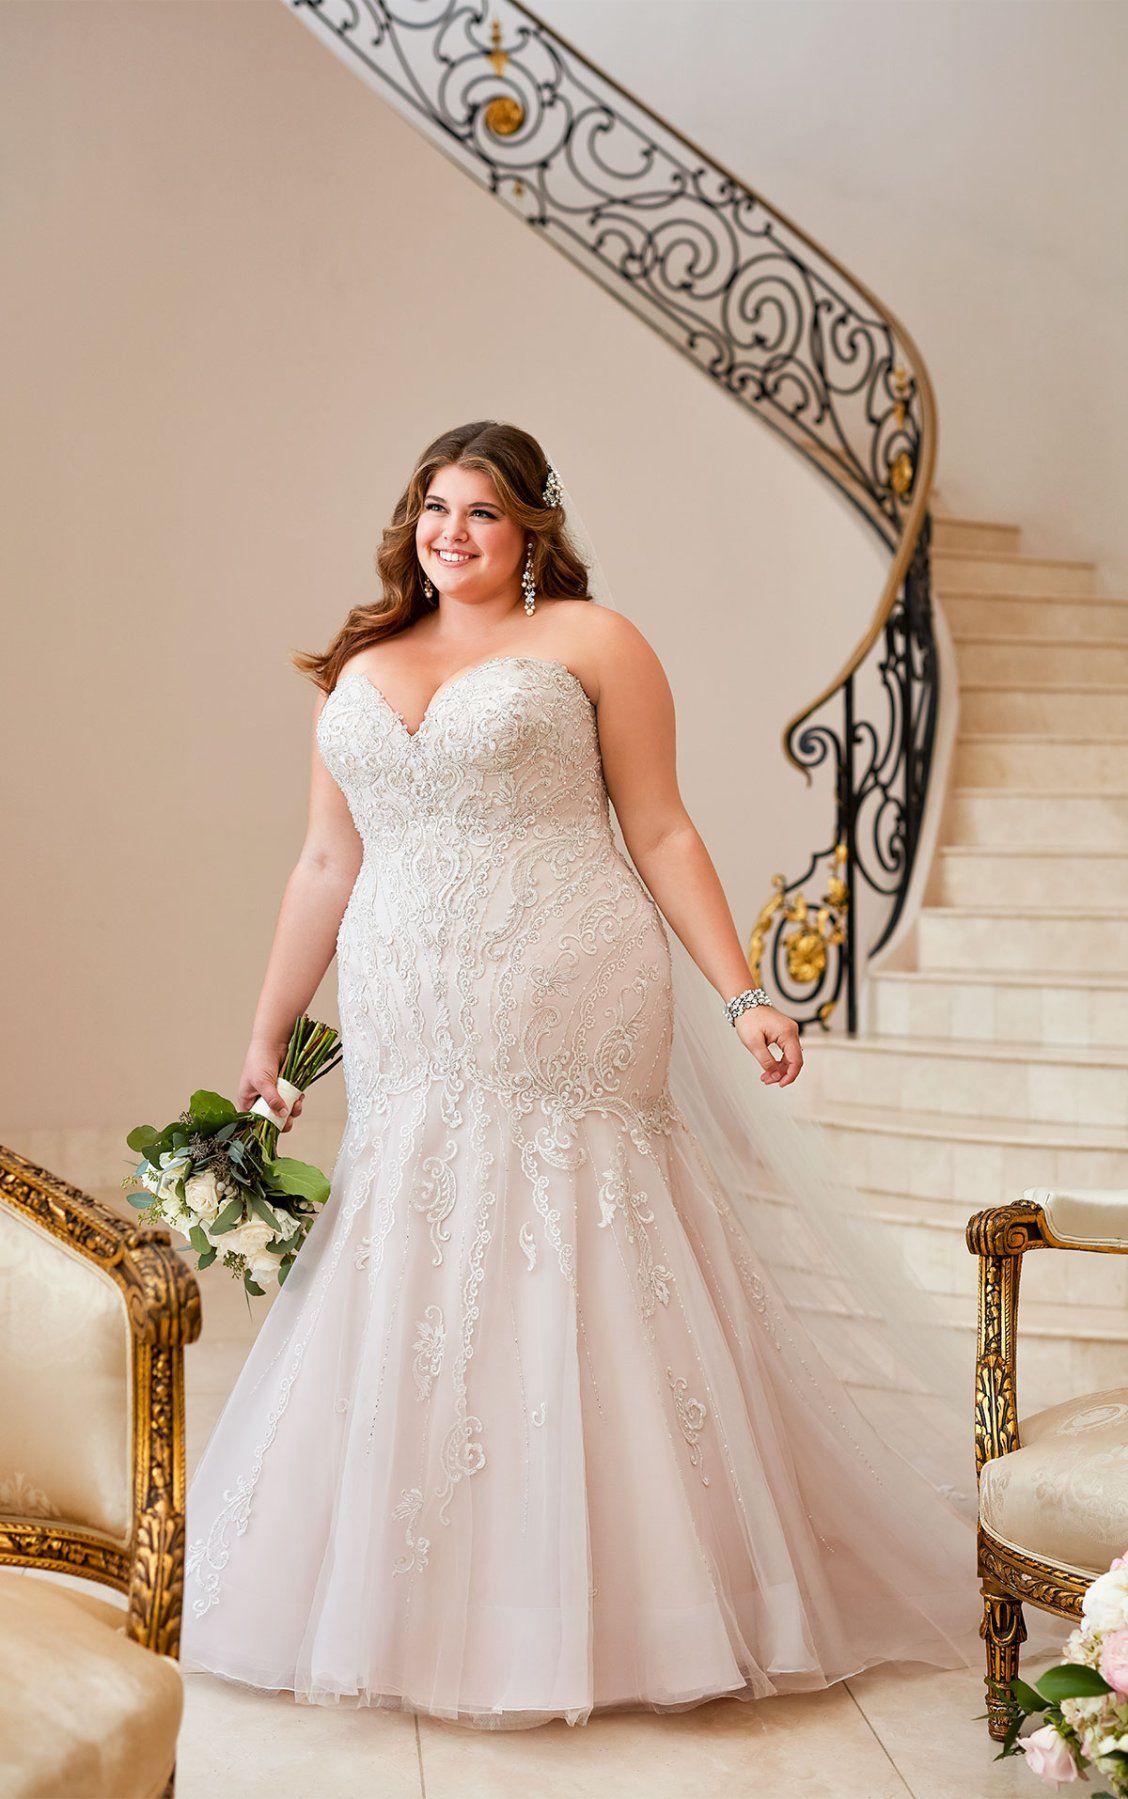 best-plus-size-wedding-dress-silhouette-tips_herstylecode-2